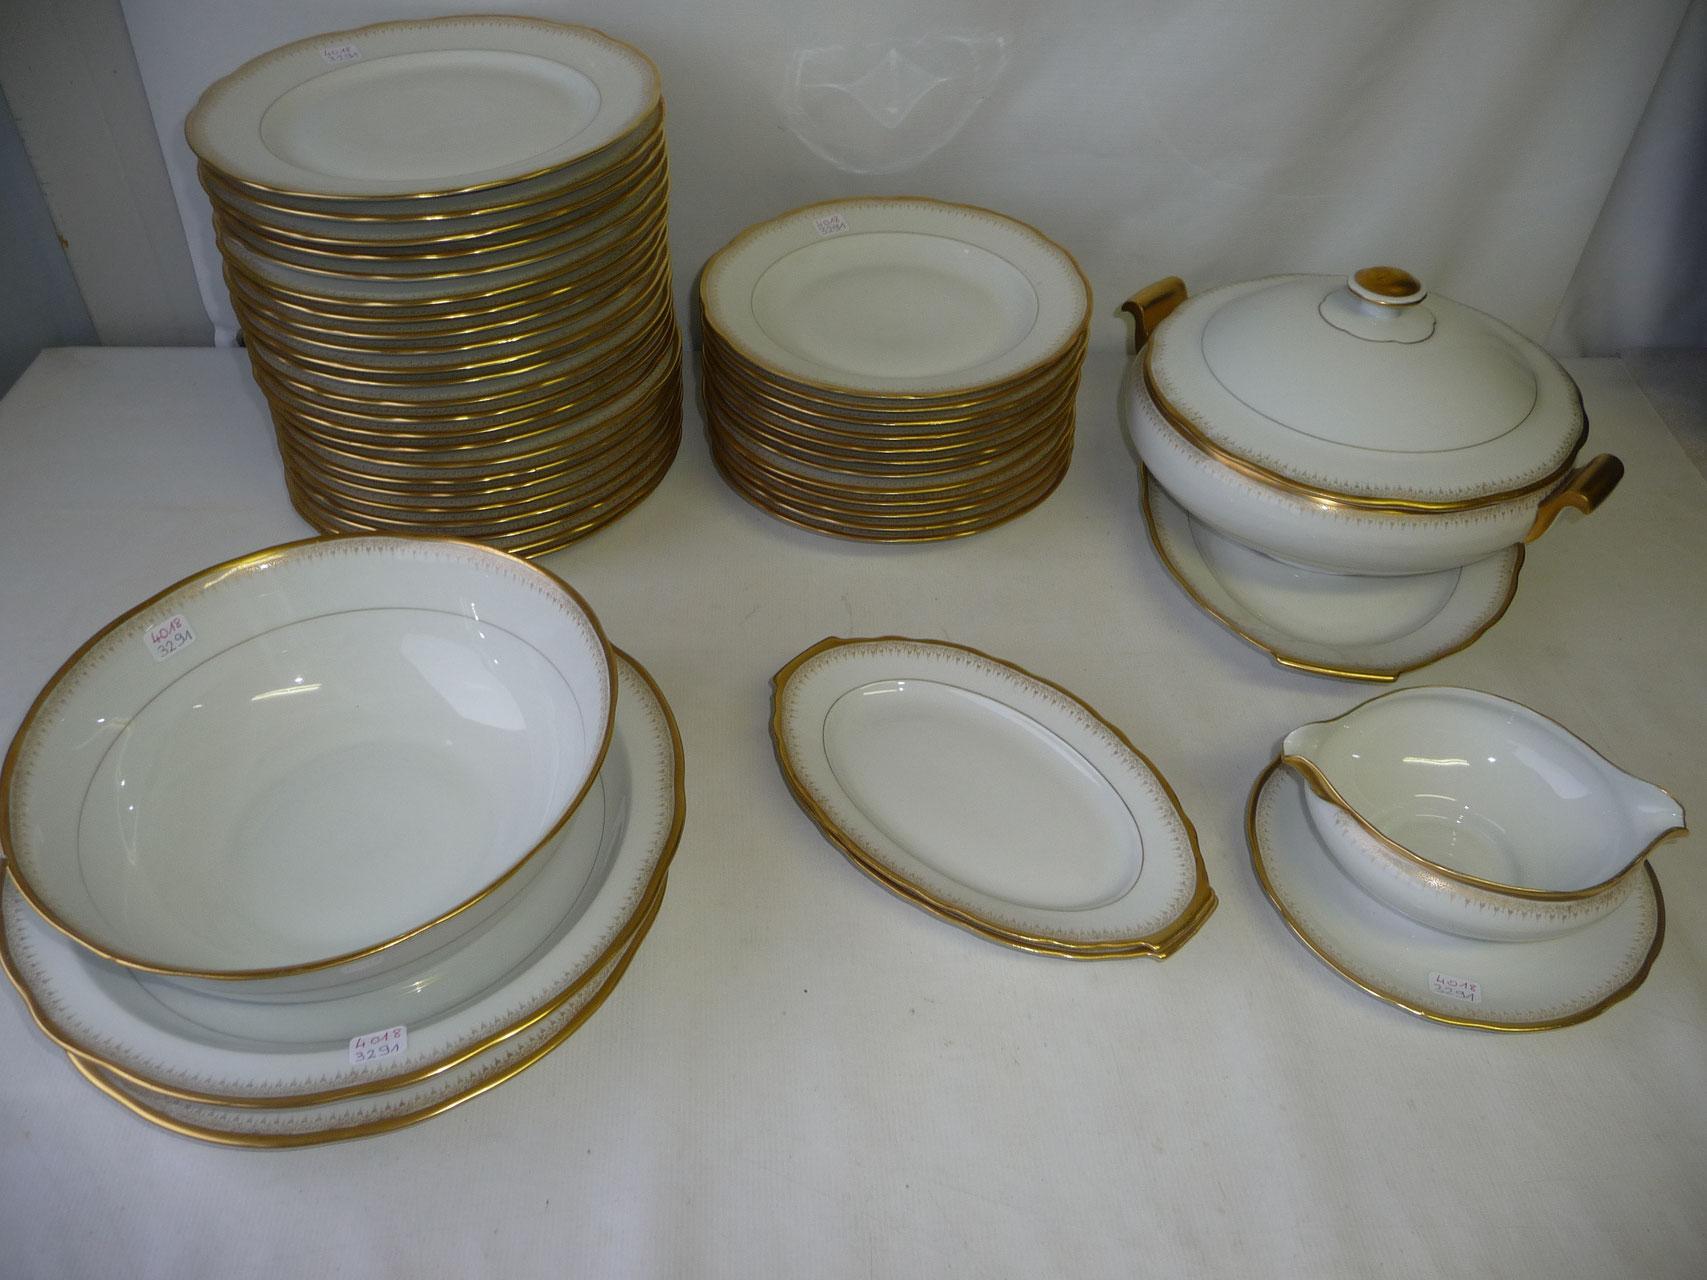 service de table porcelaine limoges service de table en porcelaine 2011040054 expertissim. Black Bedroom Furniture Sets. Home Design Ideas